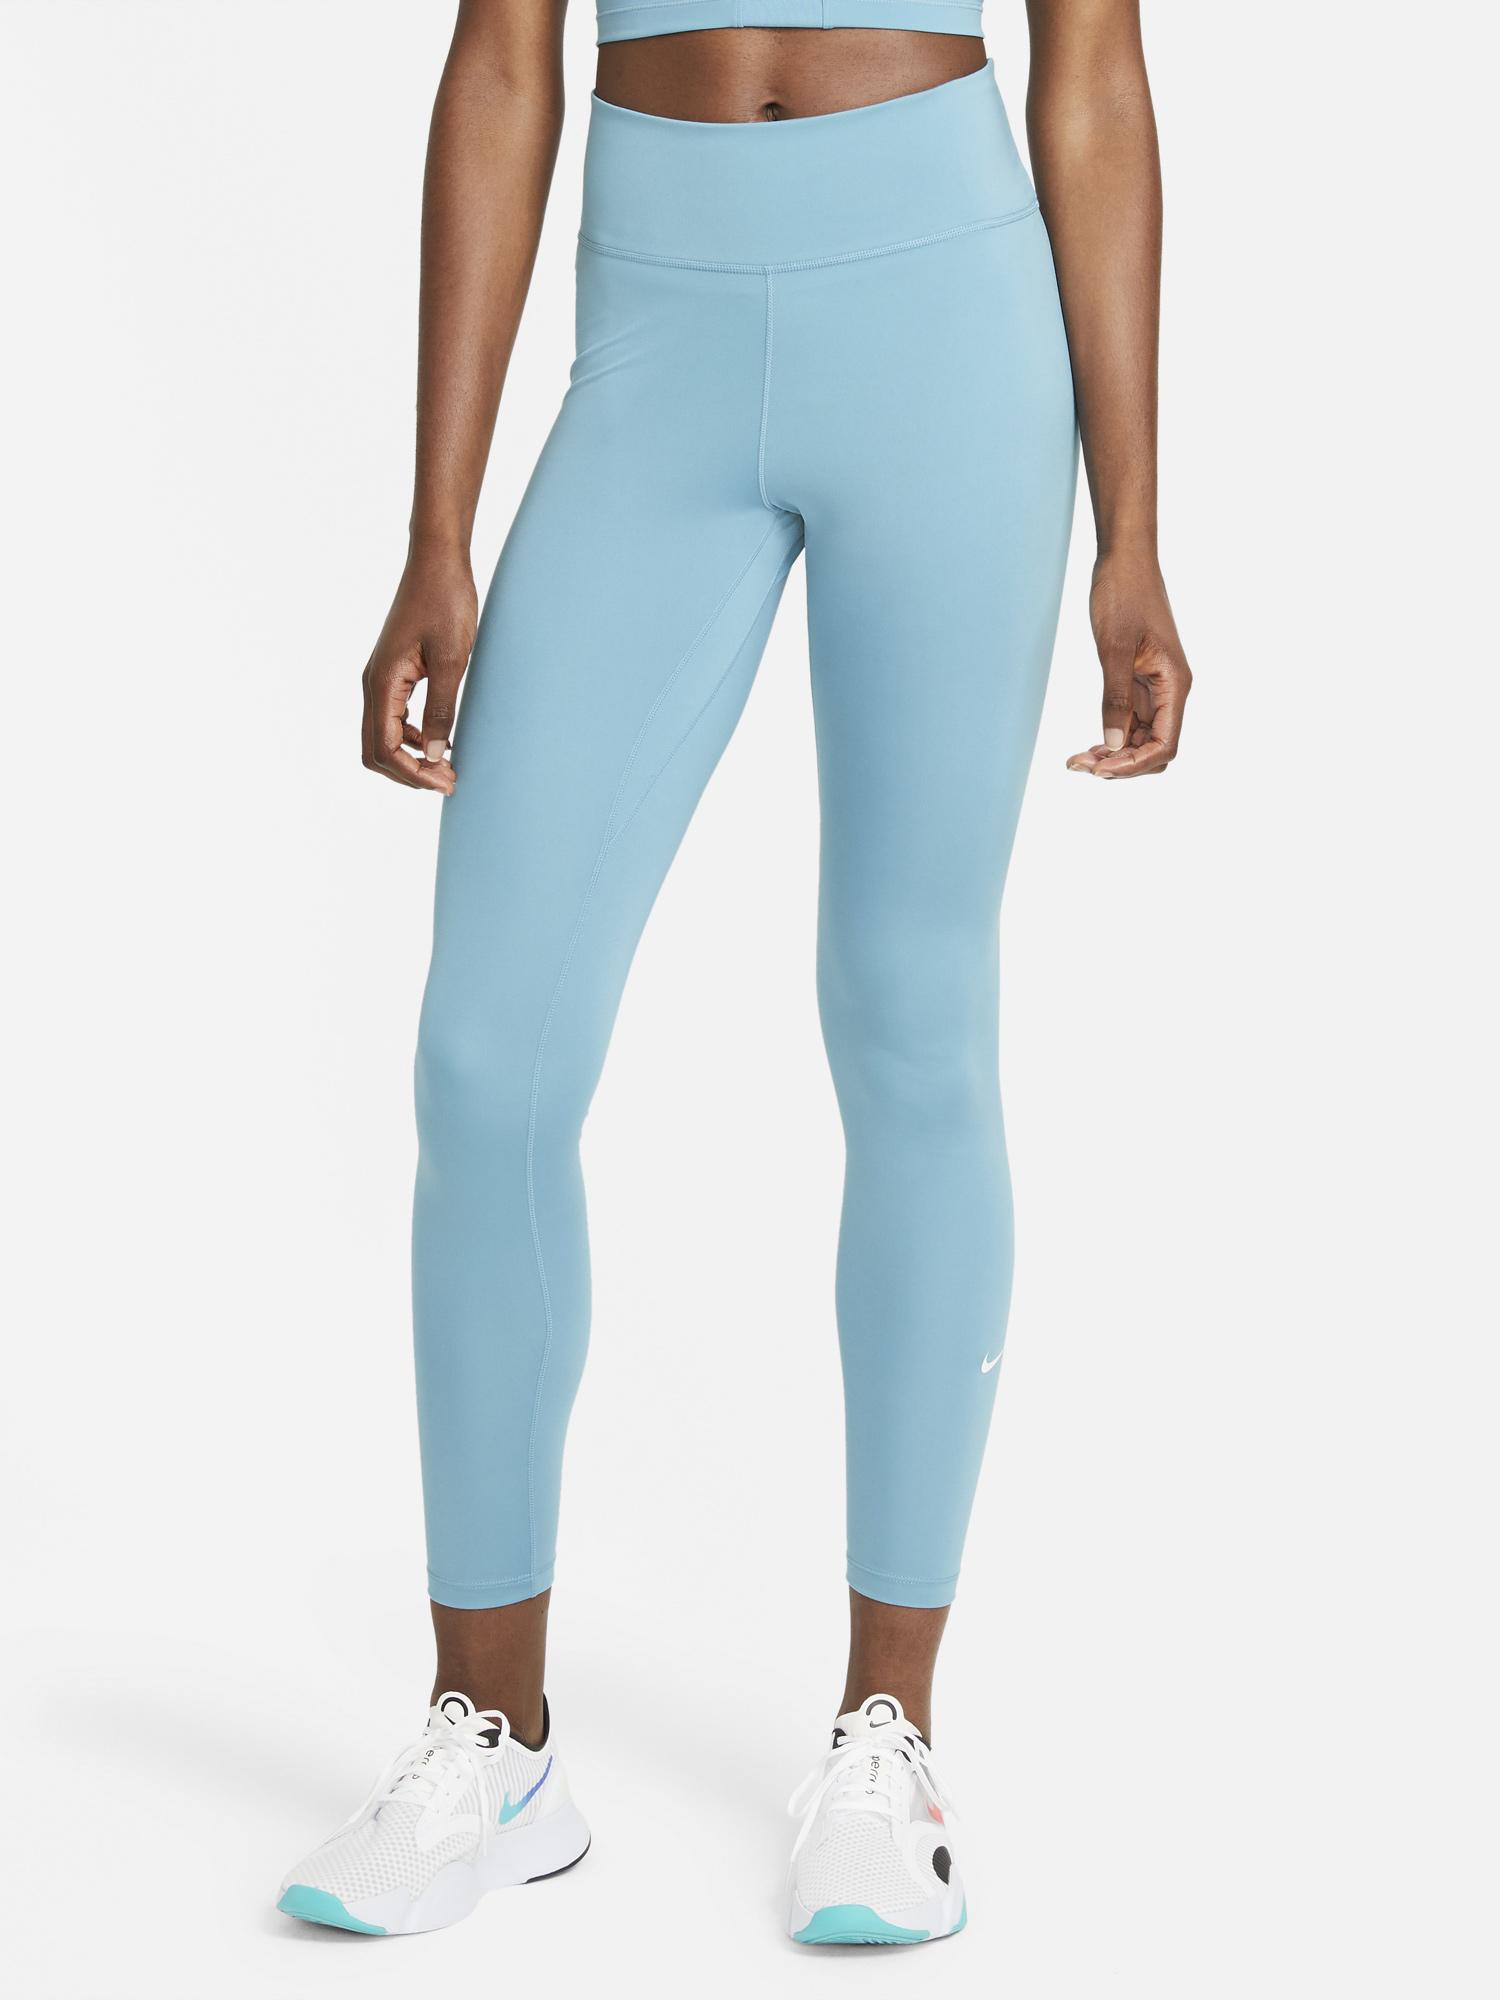 jordan-5-bluebird-womens-tights-leggings-match